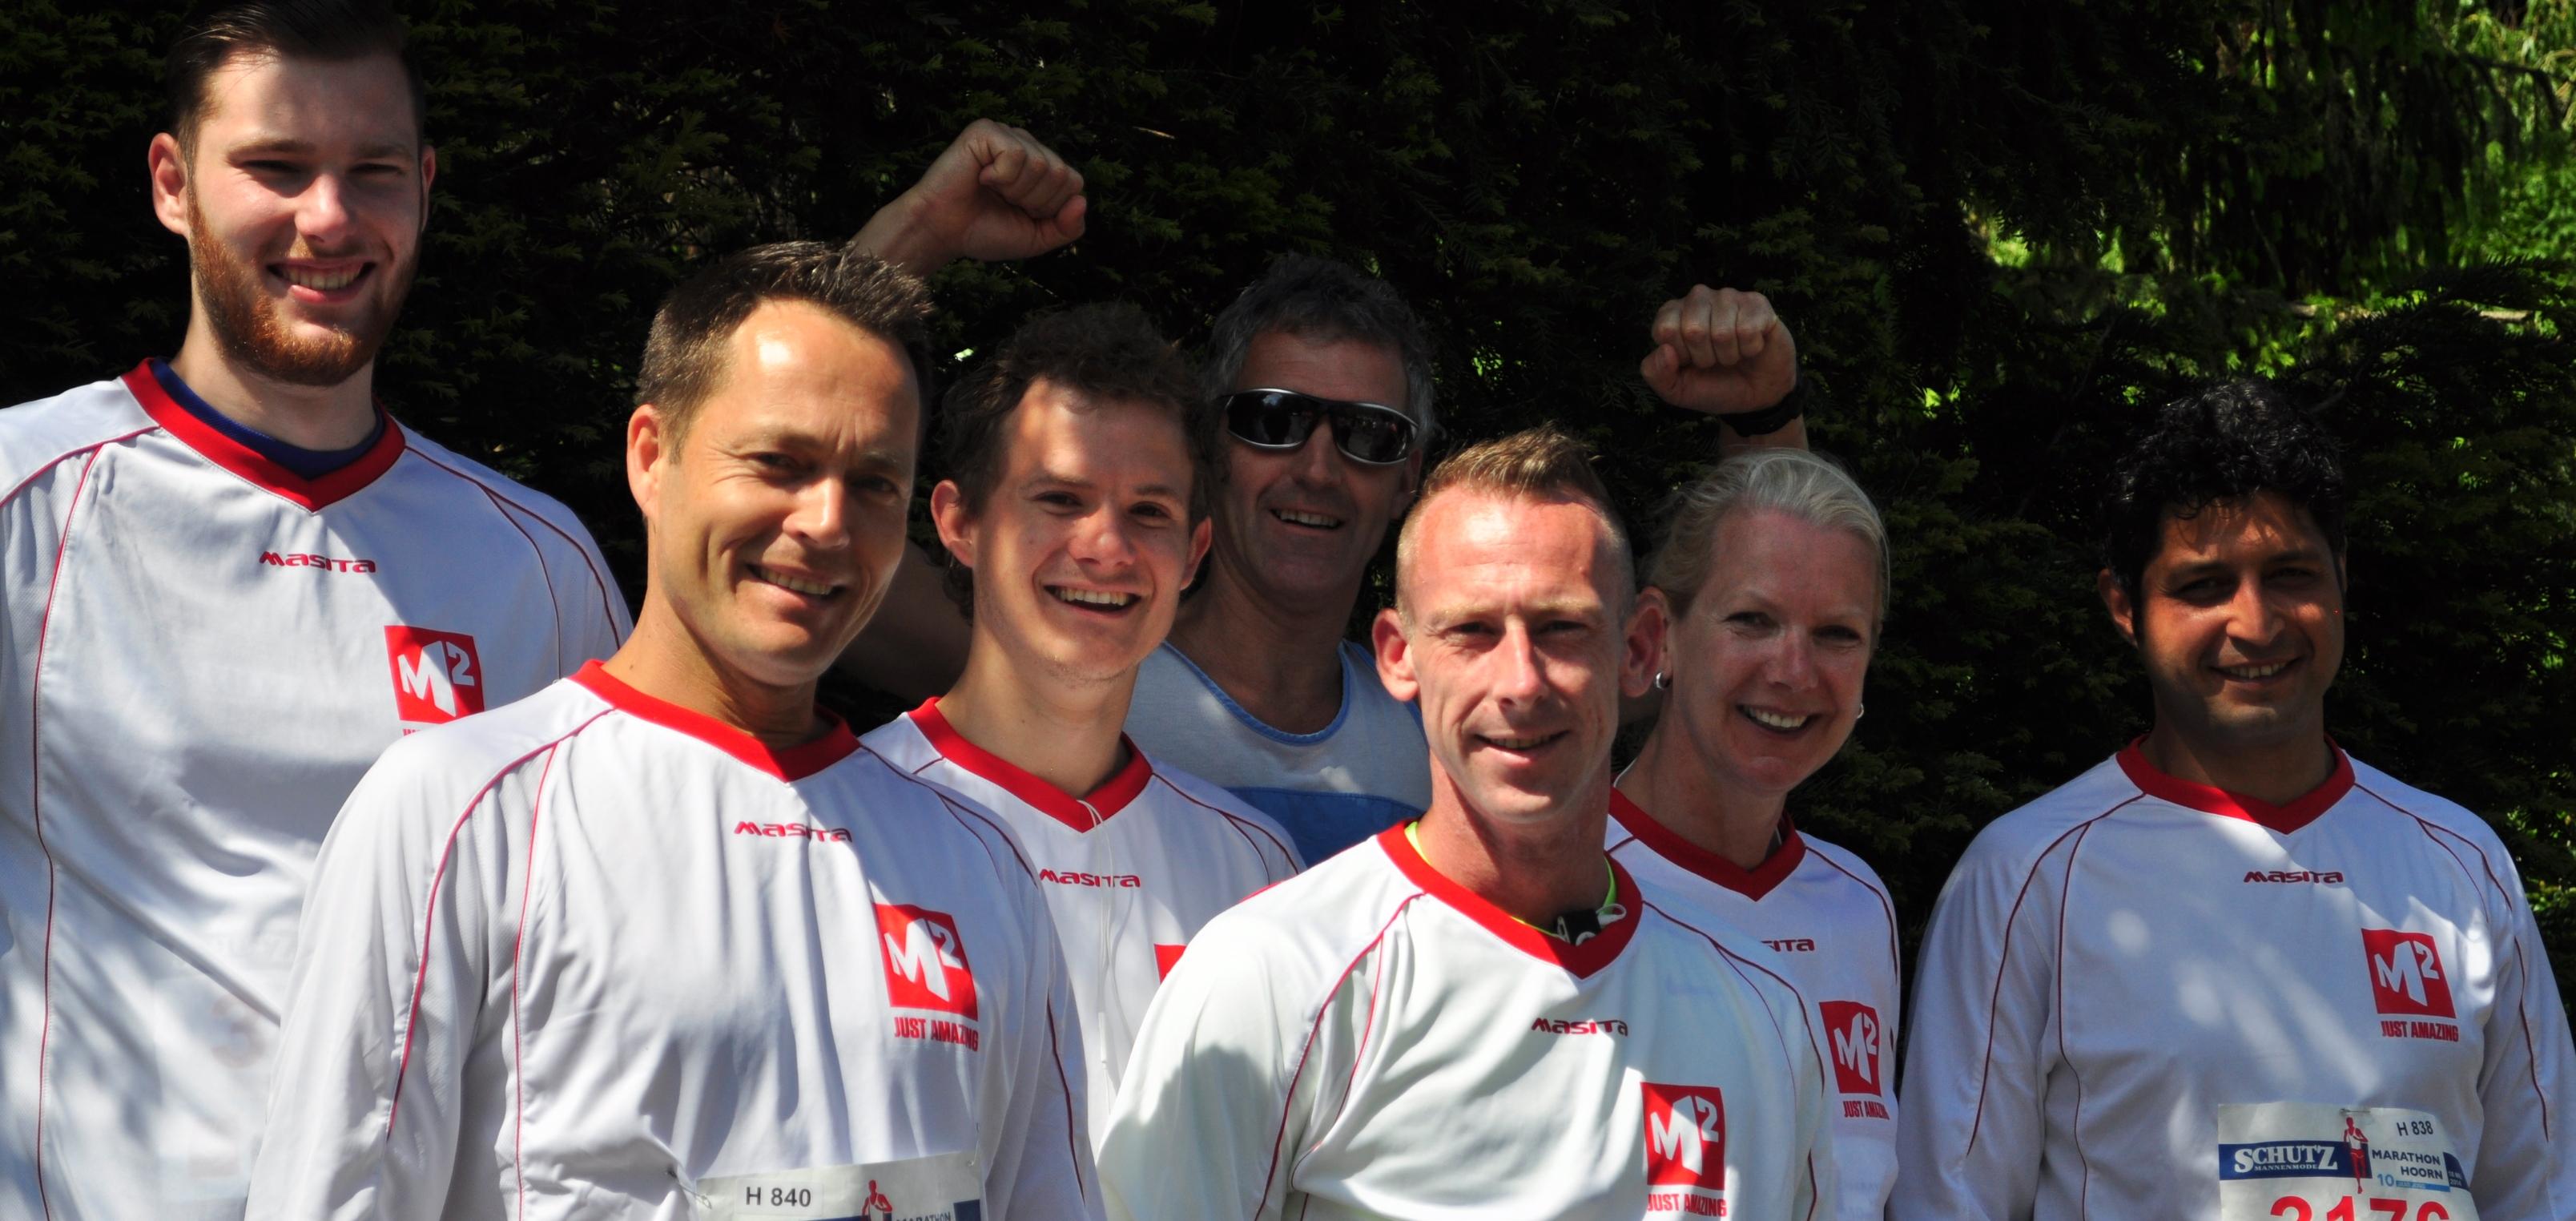 M2 Marathon Hoorn